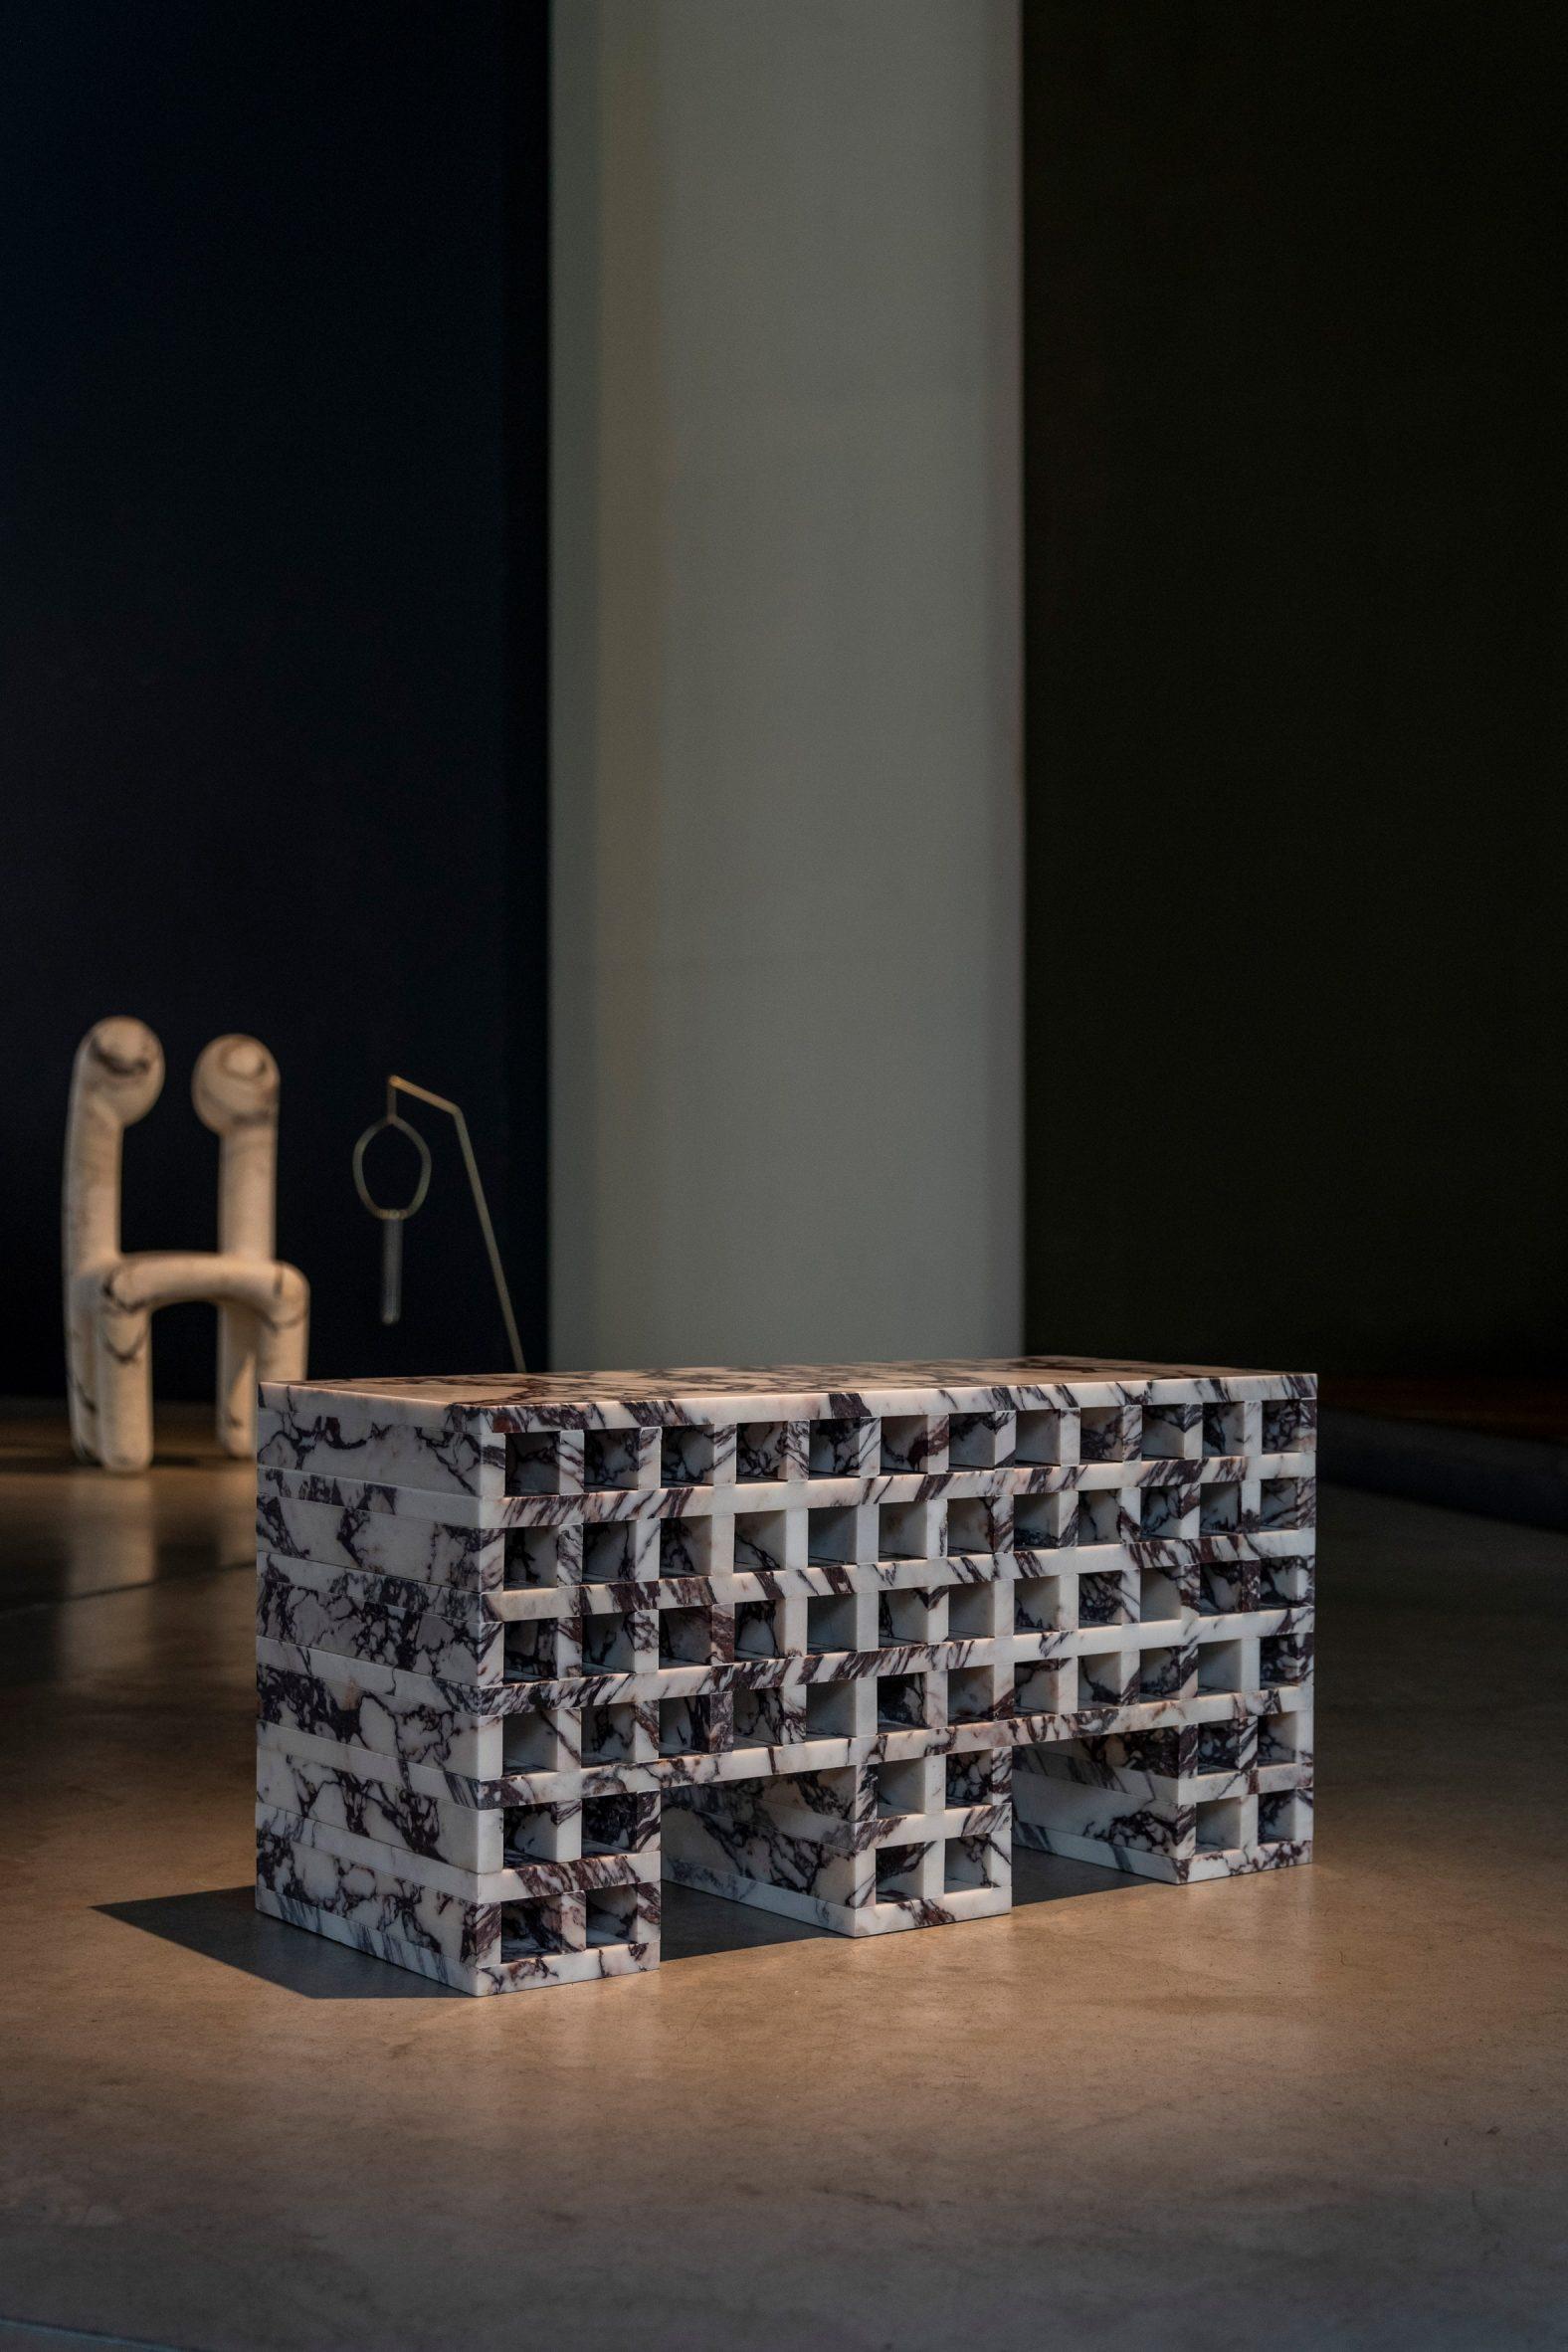 Archivia side table by Calcatta Viola at Galerie Philia exhibition